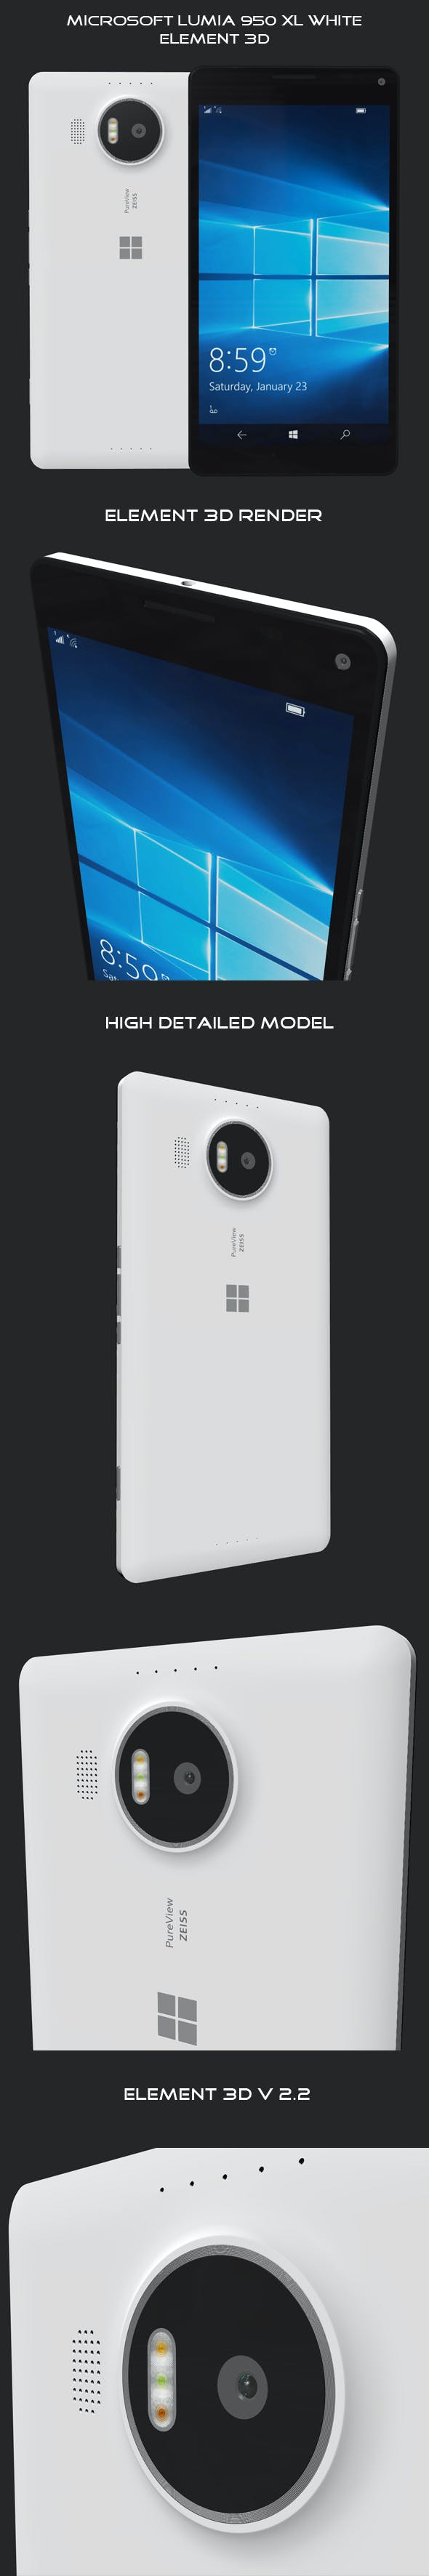 Element 3D Microsoft Lumia 950 XL White - 3DOcean Item for Sale